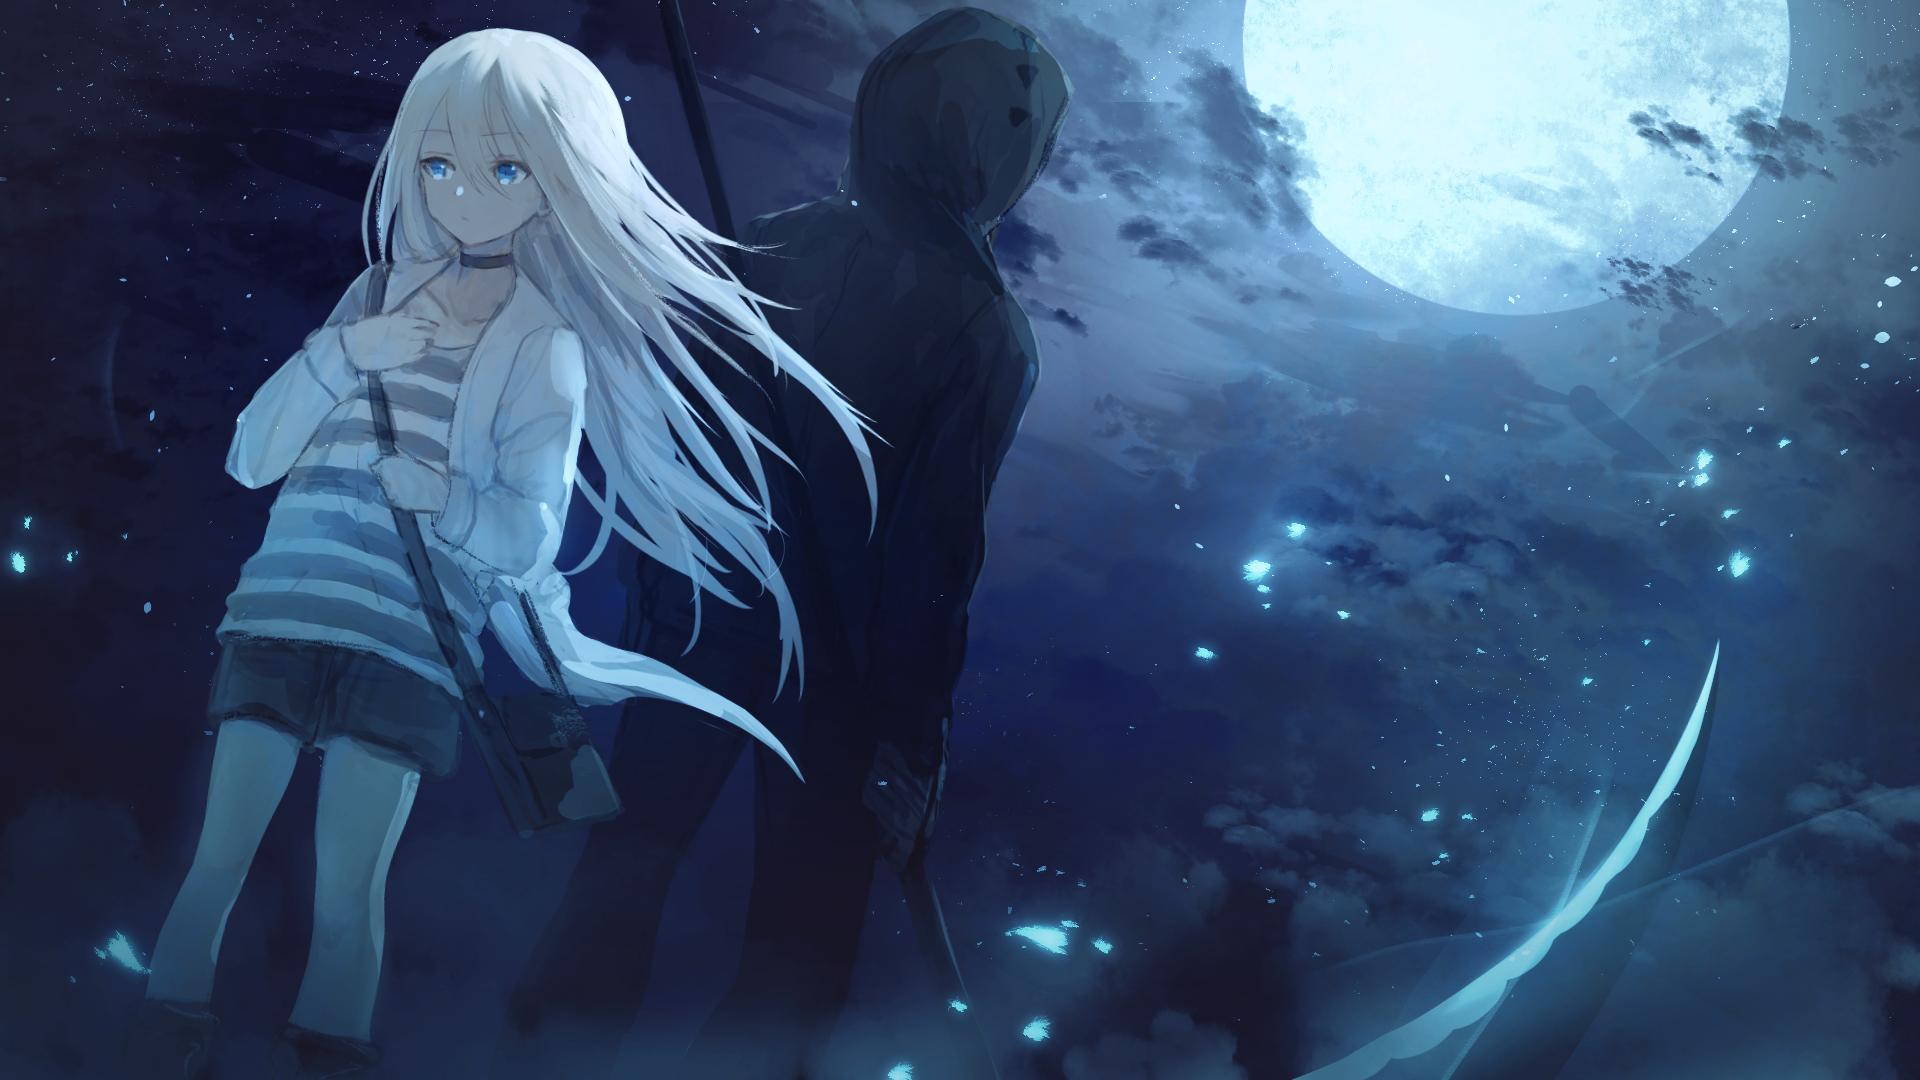 Angels Of Death Anime Wallpaper Hd Popular Desktop Wallpaper